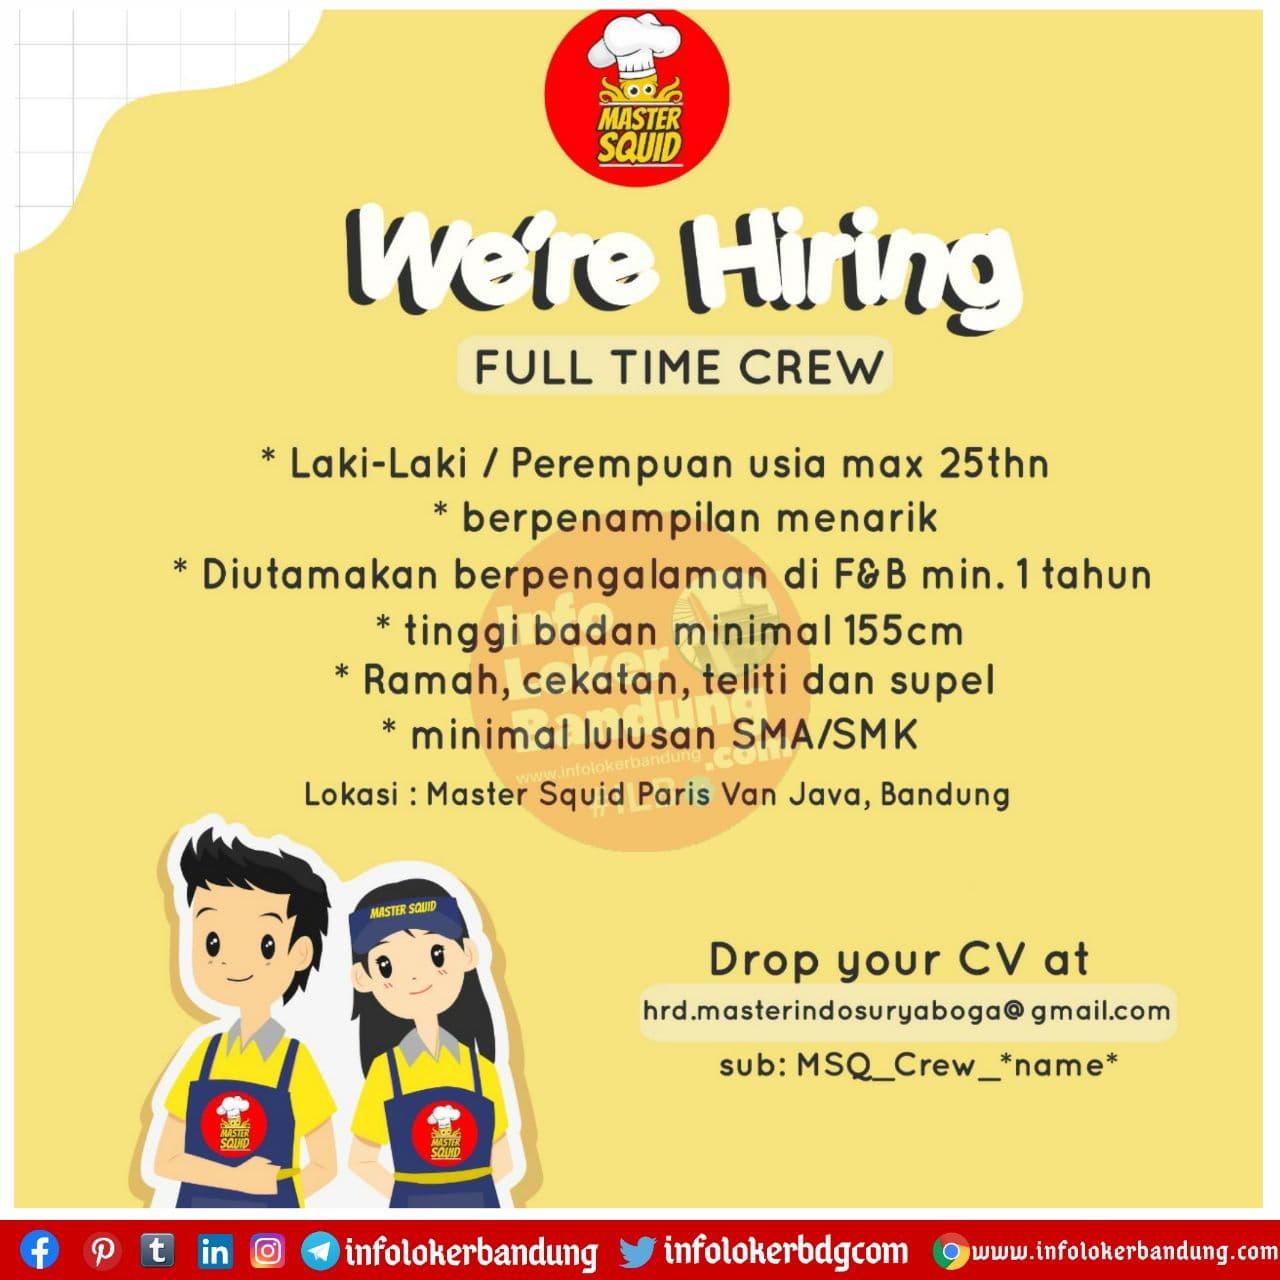 Lowongan Kerja Full Time Crew Master Squid Bandung November 2020